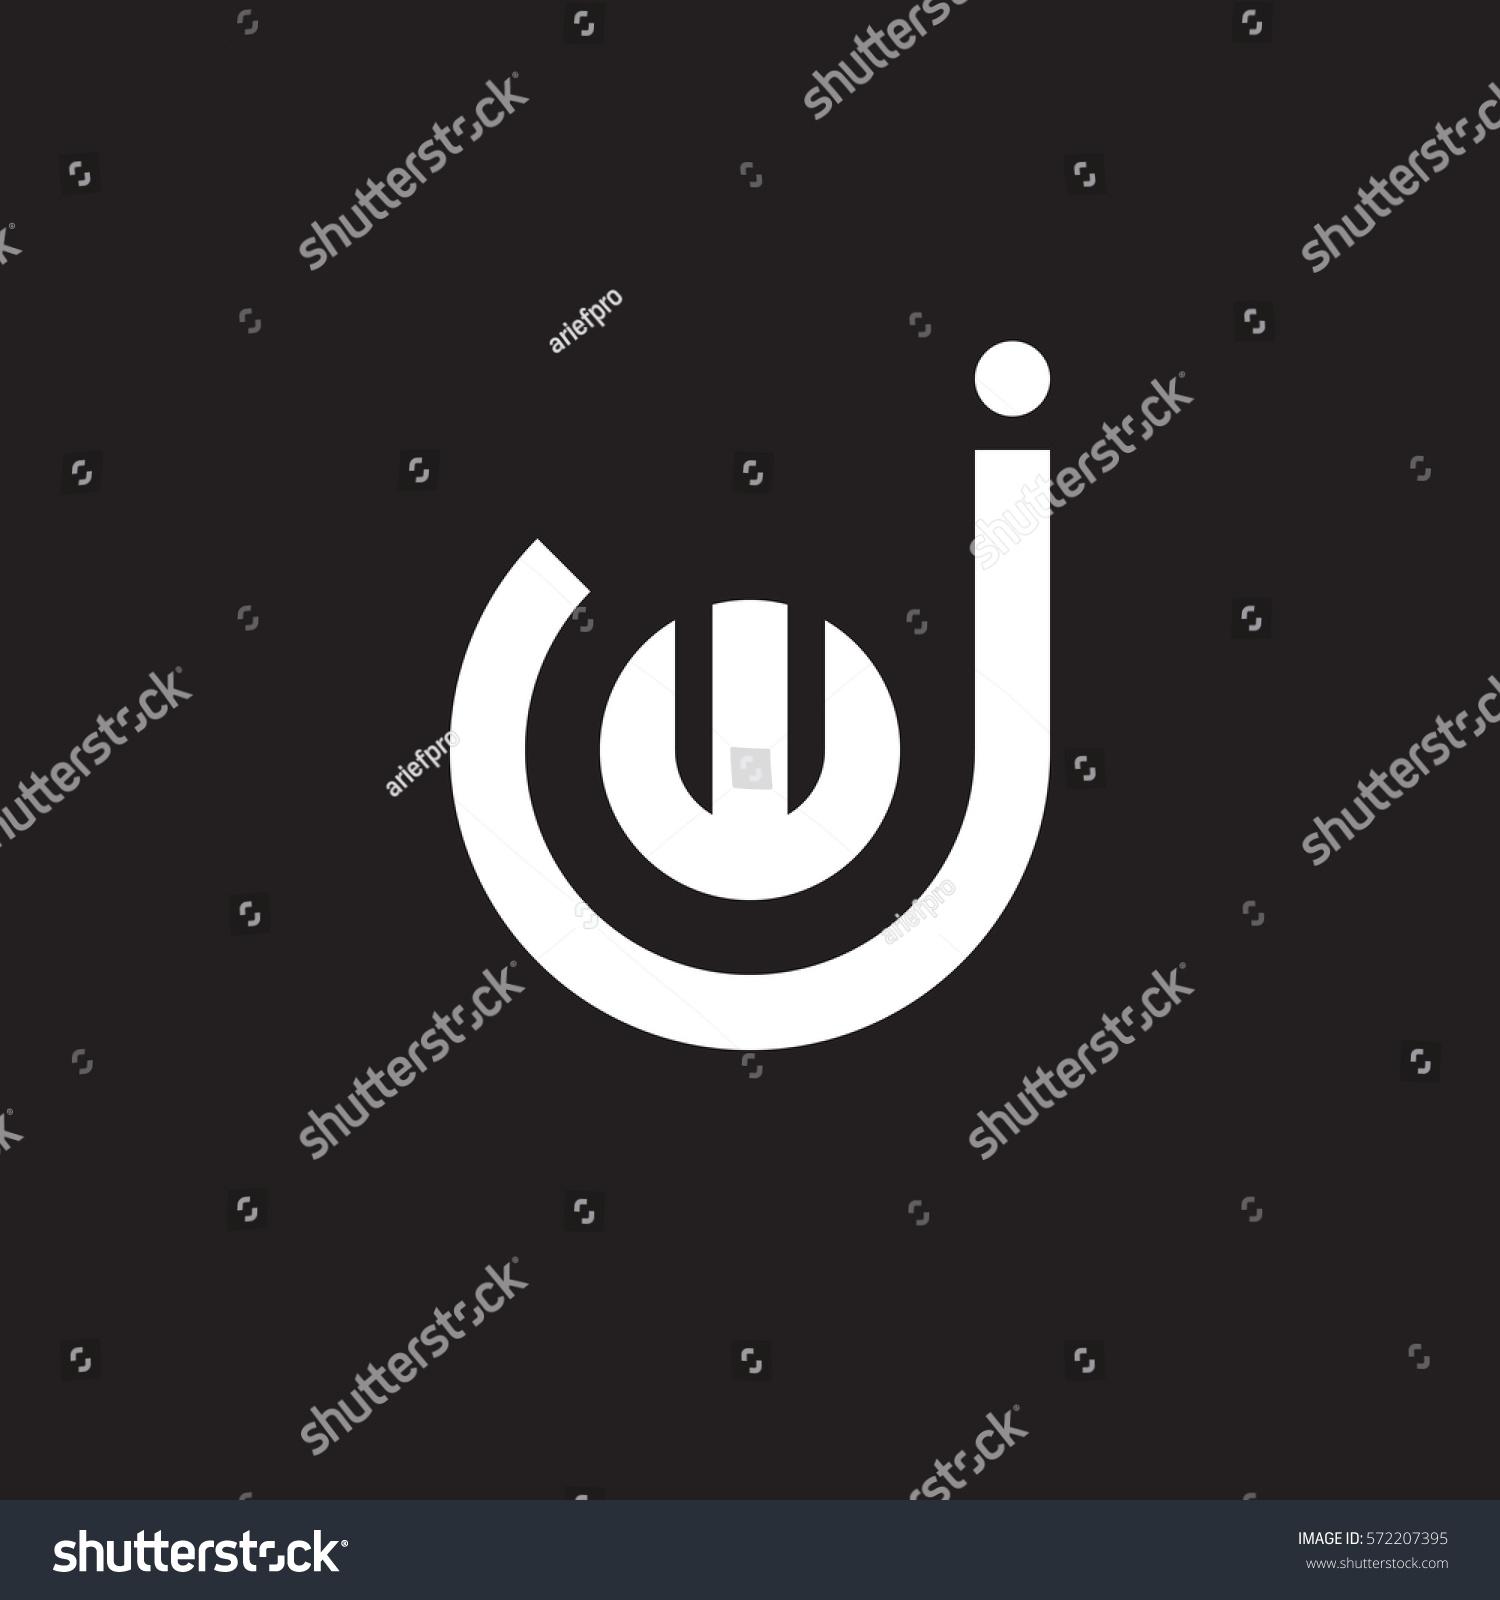 Initial Letter Logo Jw Wj W Stock Vector Royalty 572207395 1500x1600